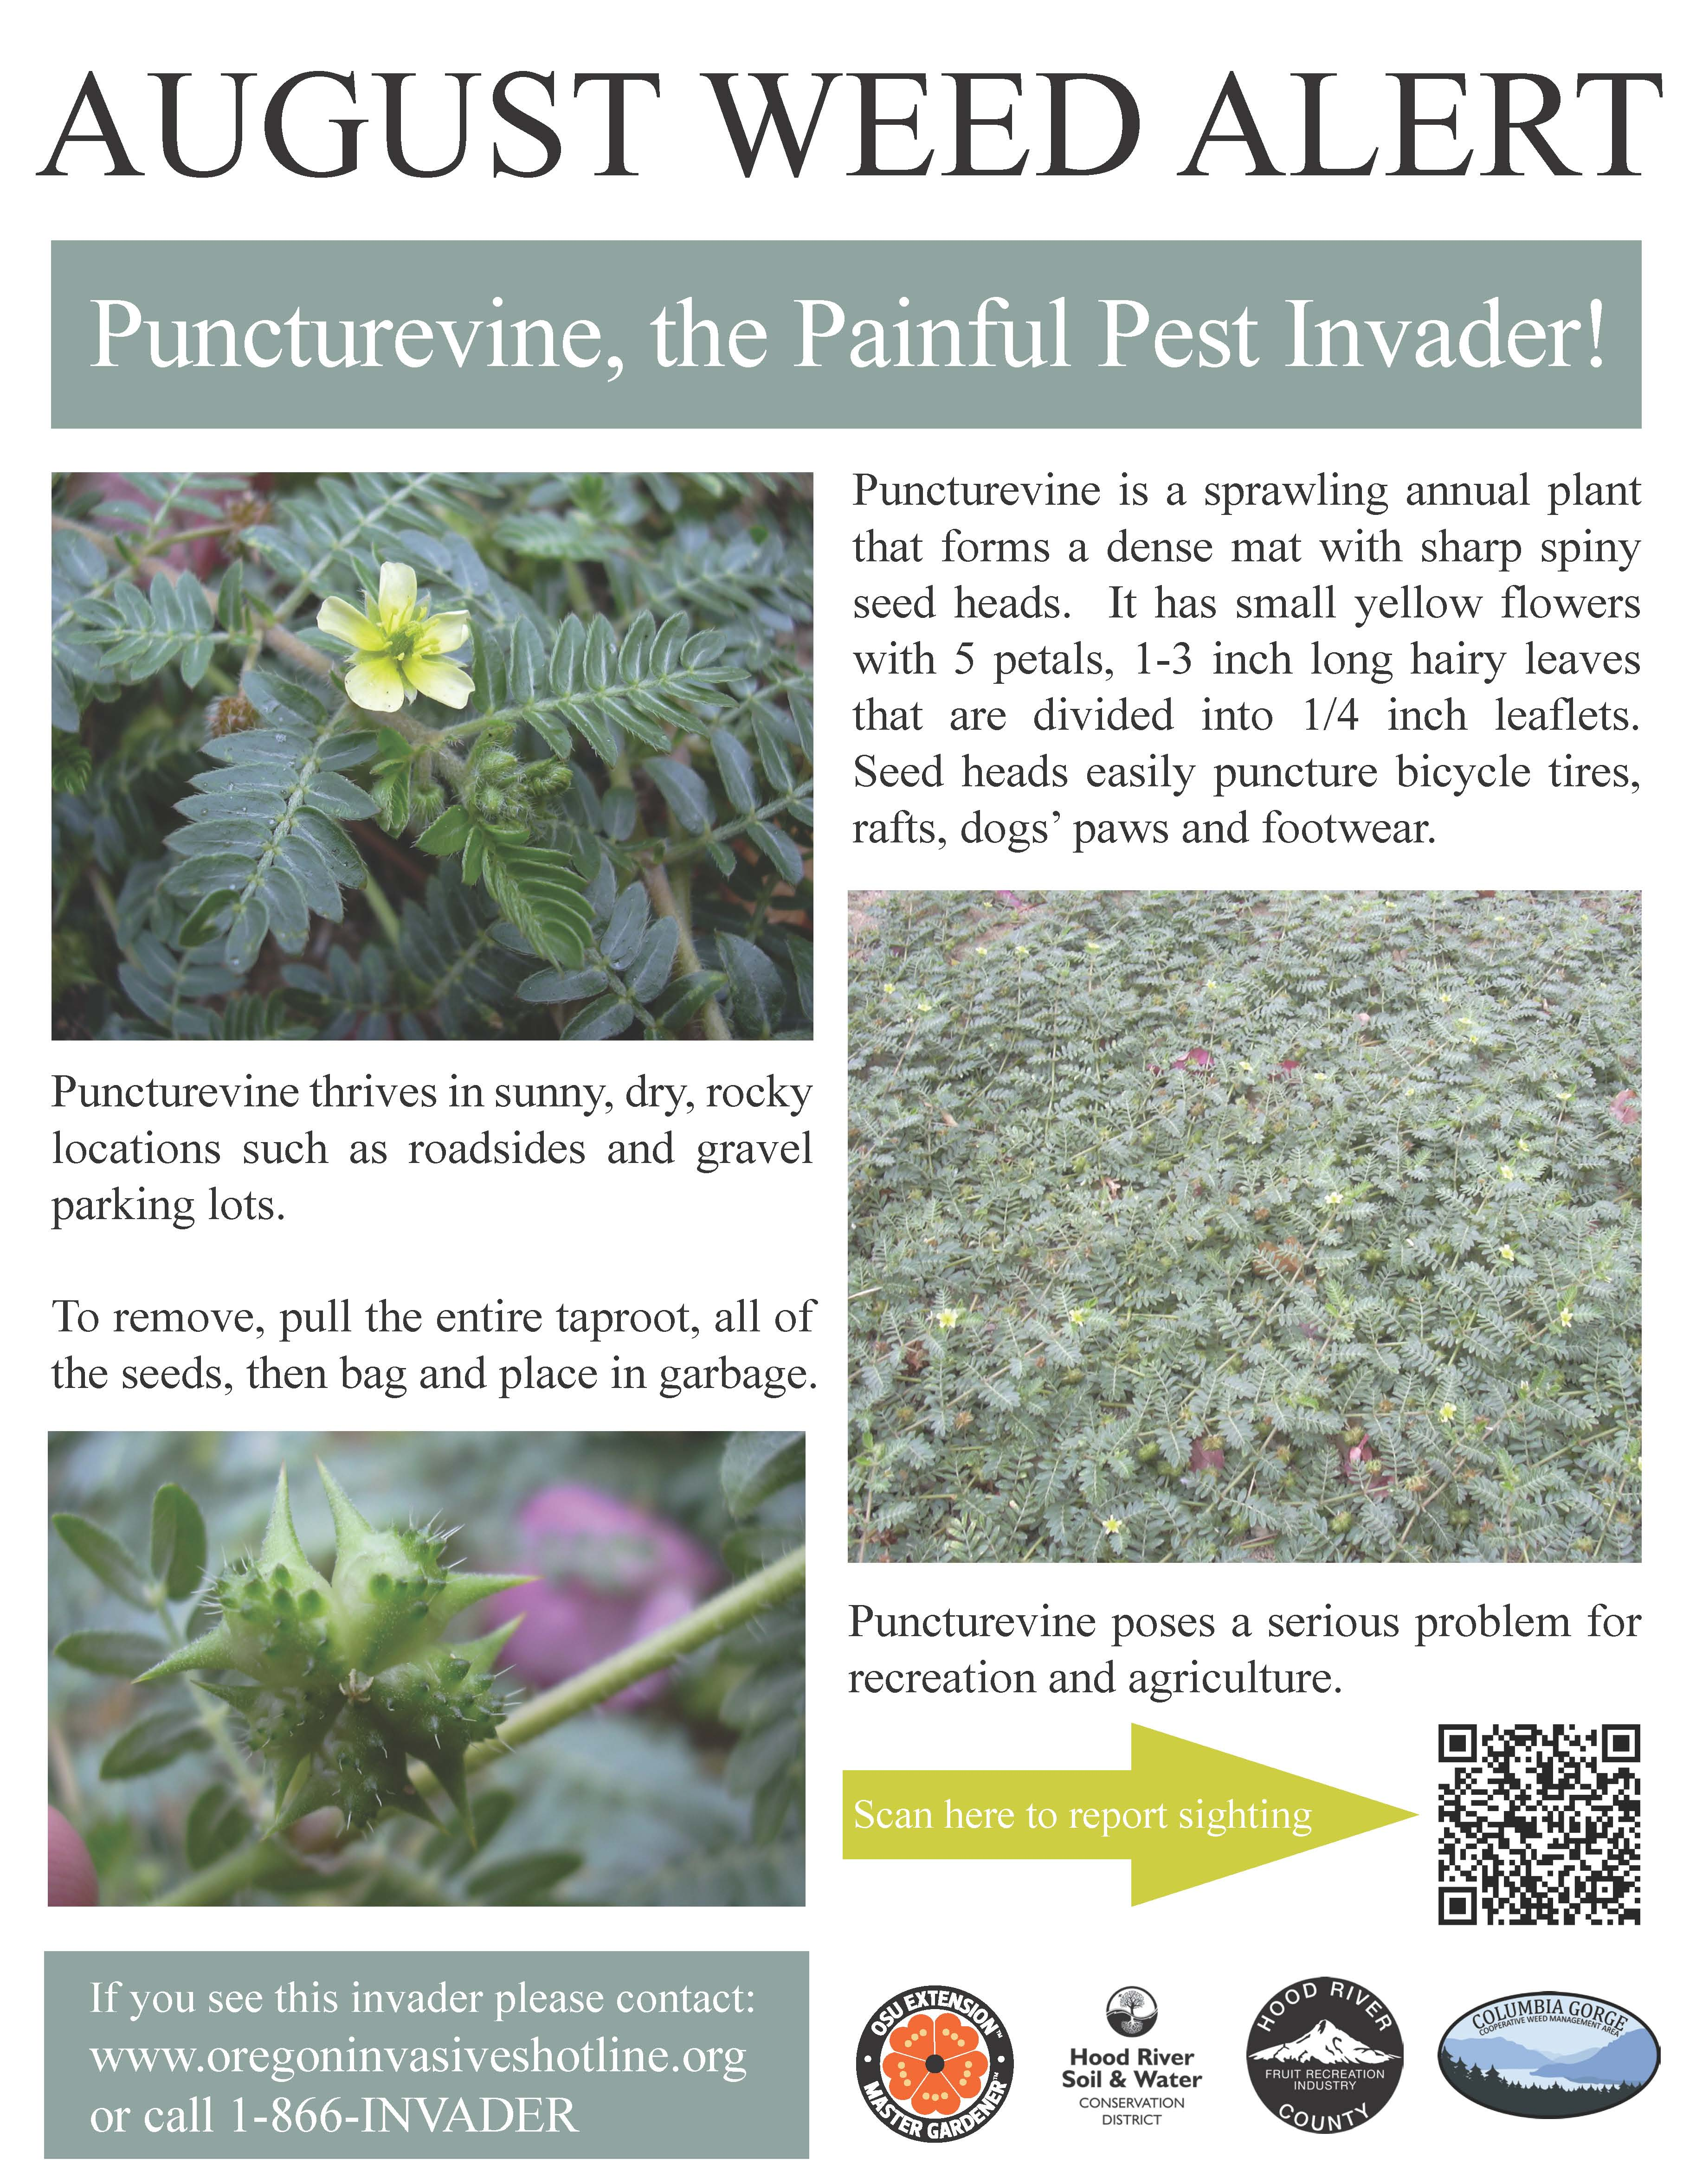 Puncturevine_Aug Weed Alert_Poster